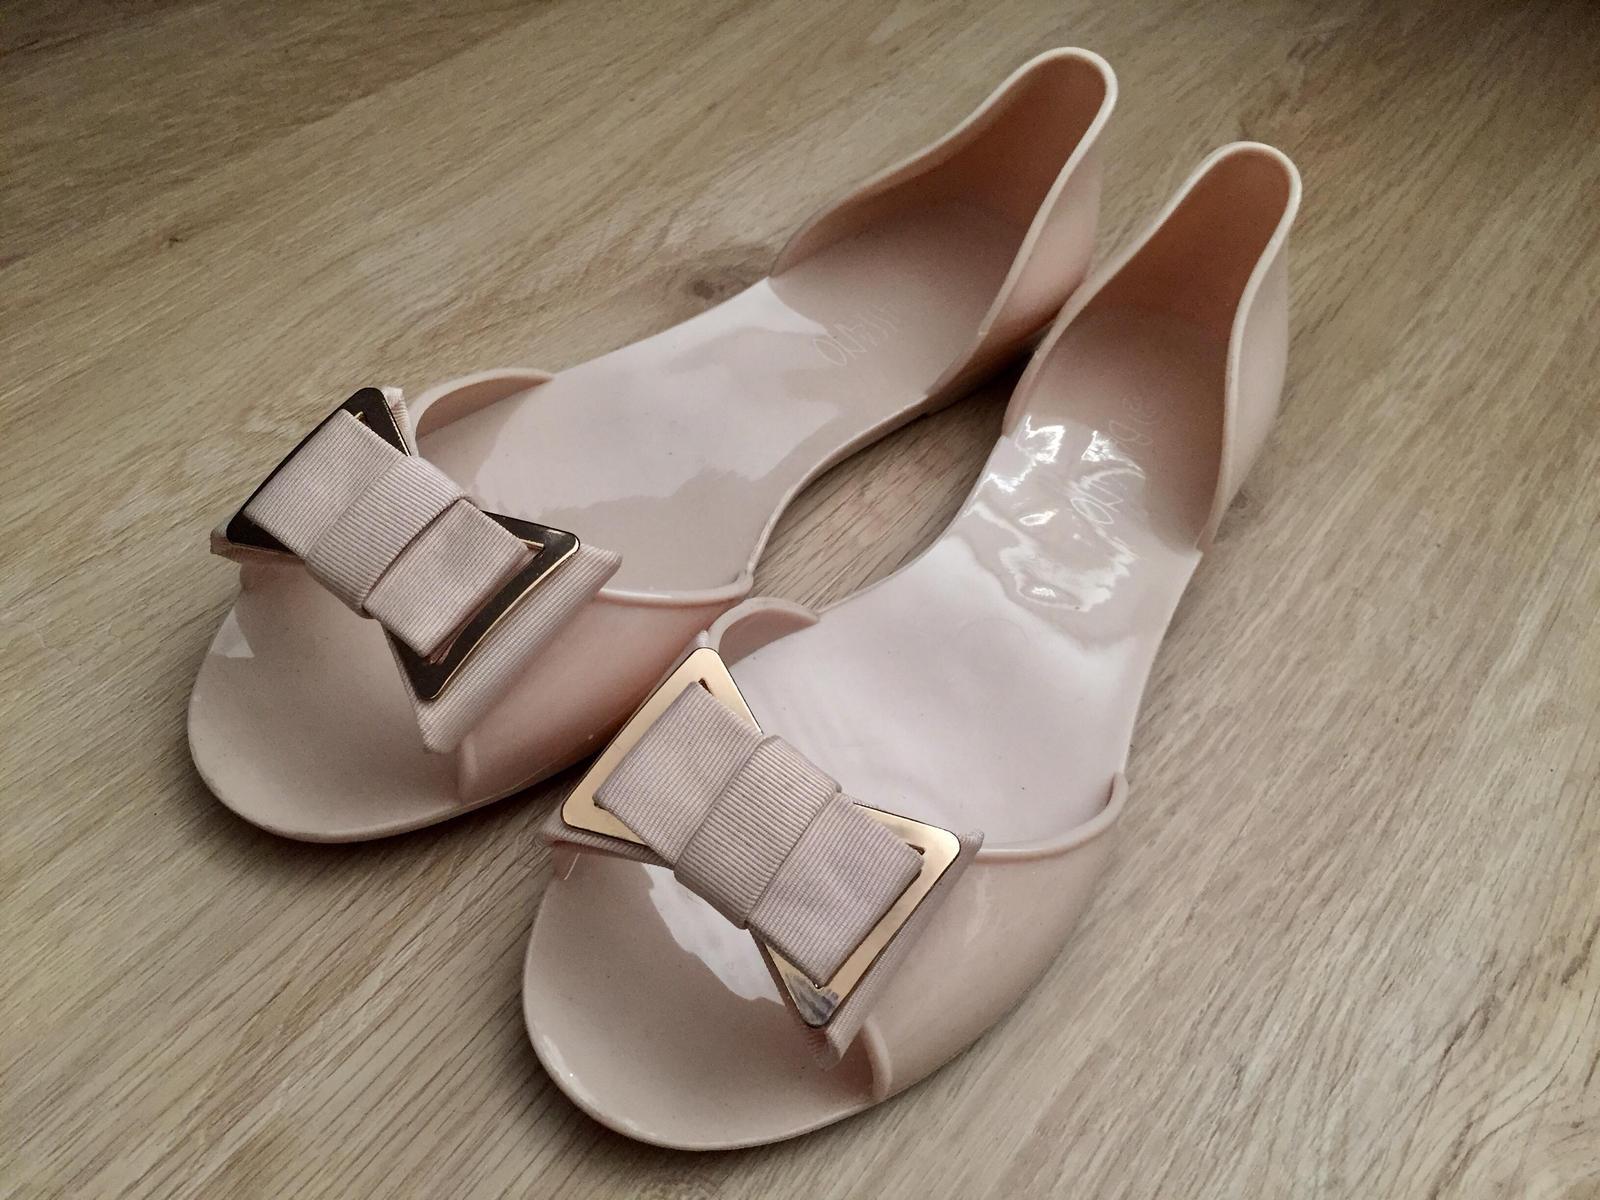 Sandále s otvorenou špičkou, 1x obuté - Obrázok č. 1